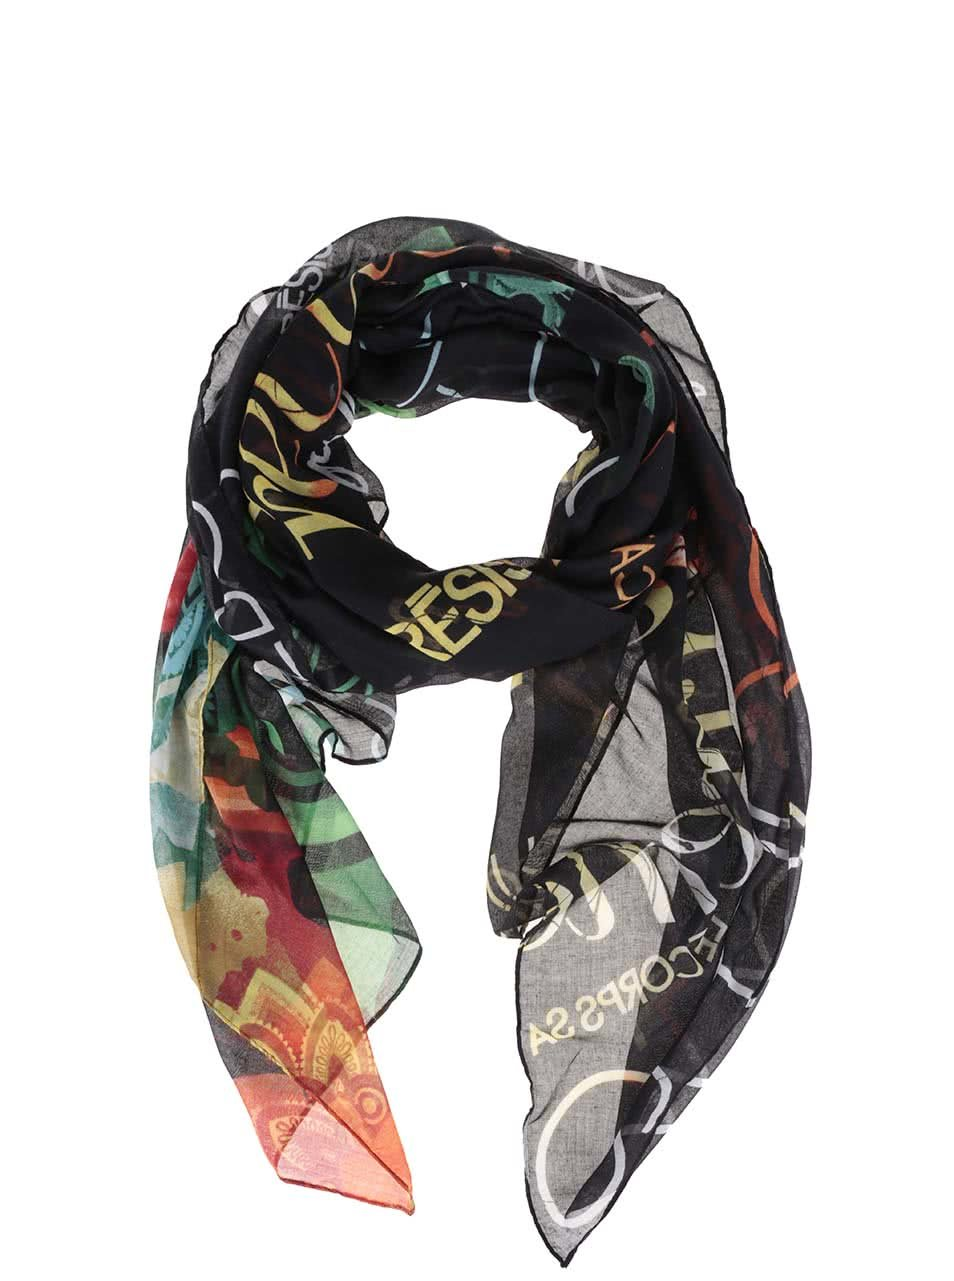 Černý šátek s barevnými nápisy Desigual Heritatge